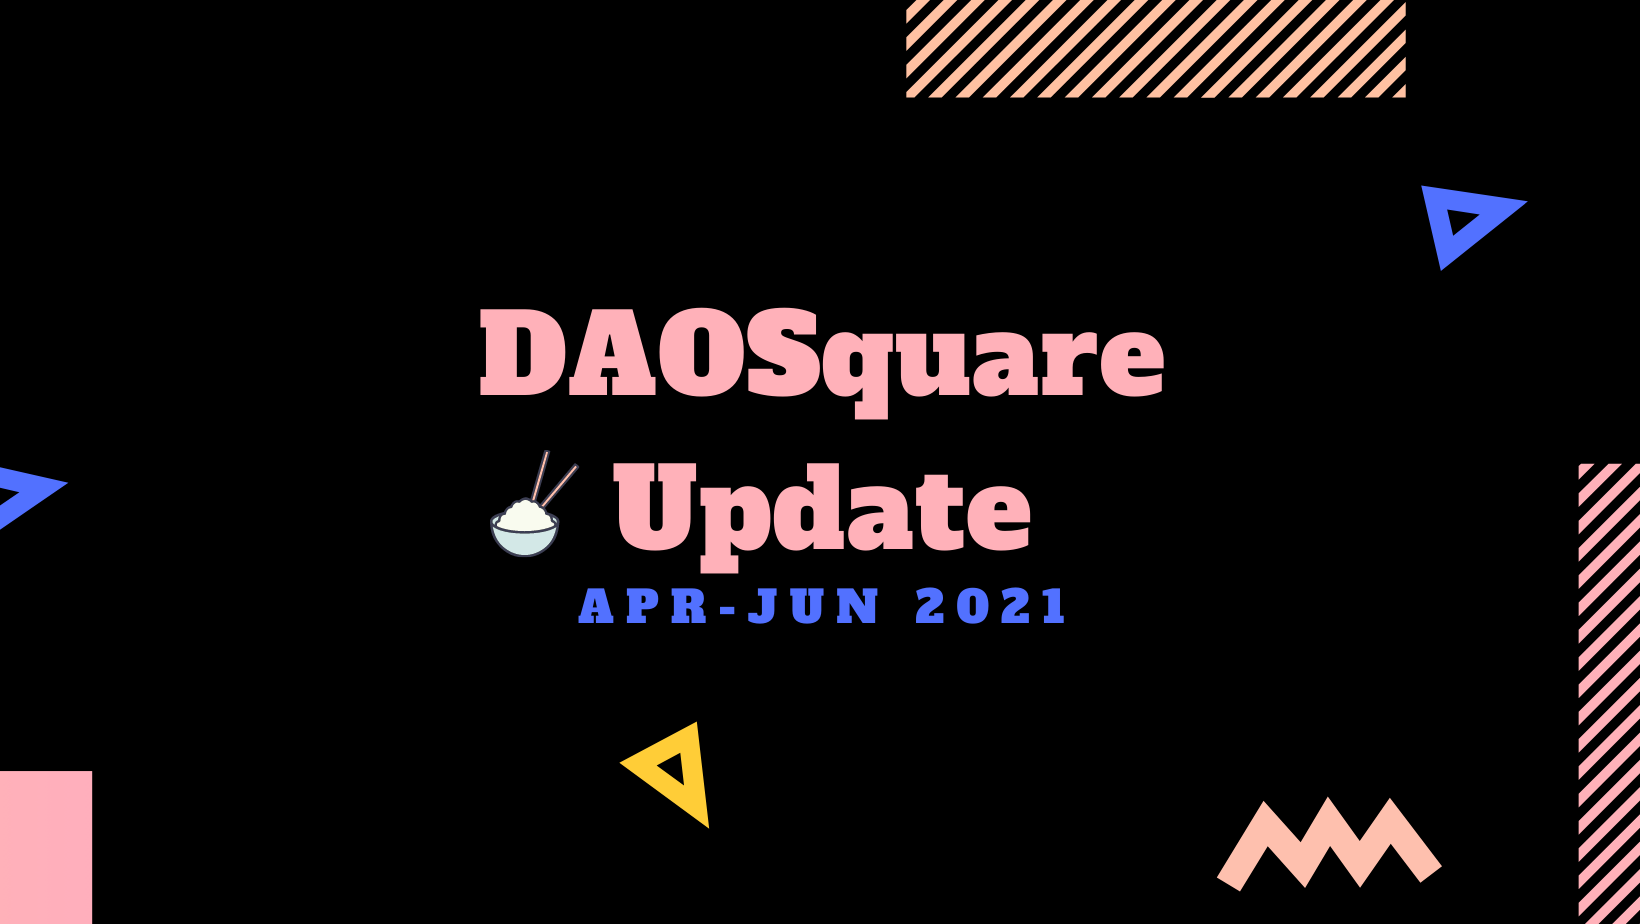 DAOSquare近期进展更新